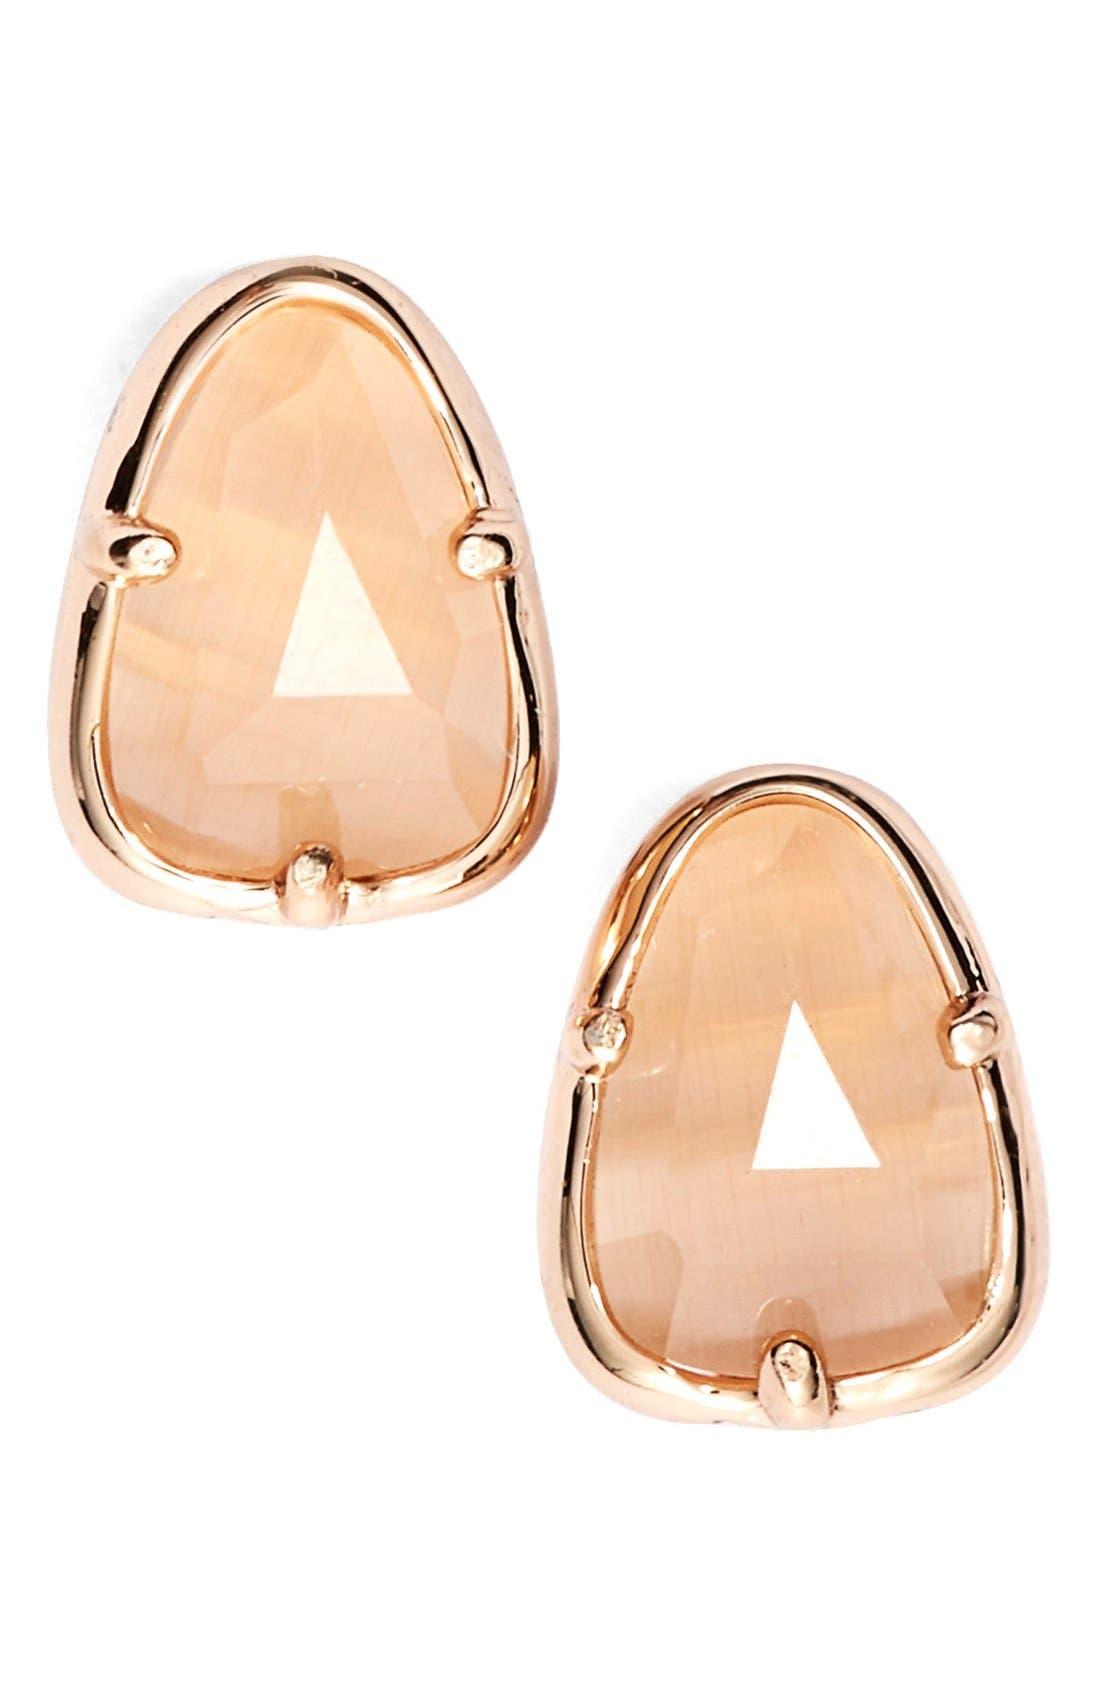 Alternate Image 1 Selected - Kendra Scott 'Hazel' Stud Earrings